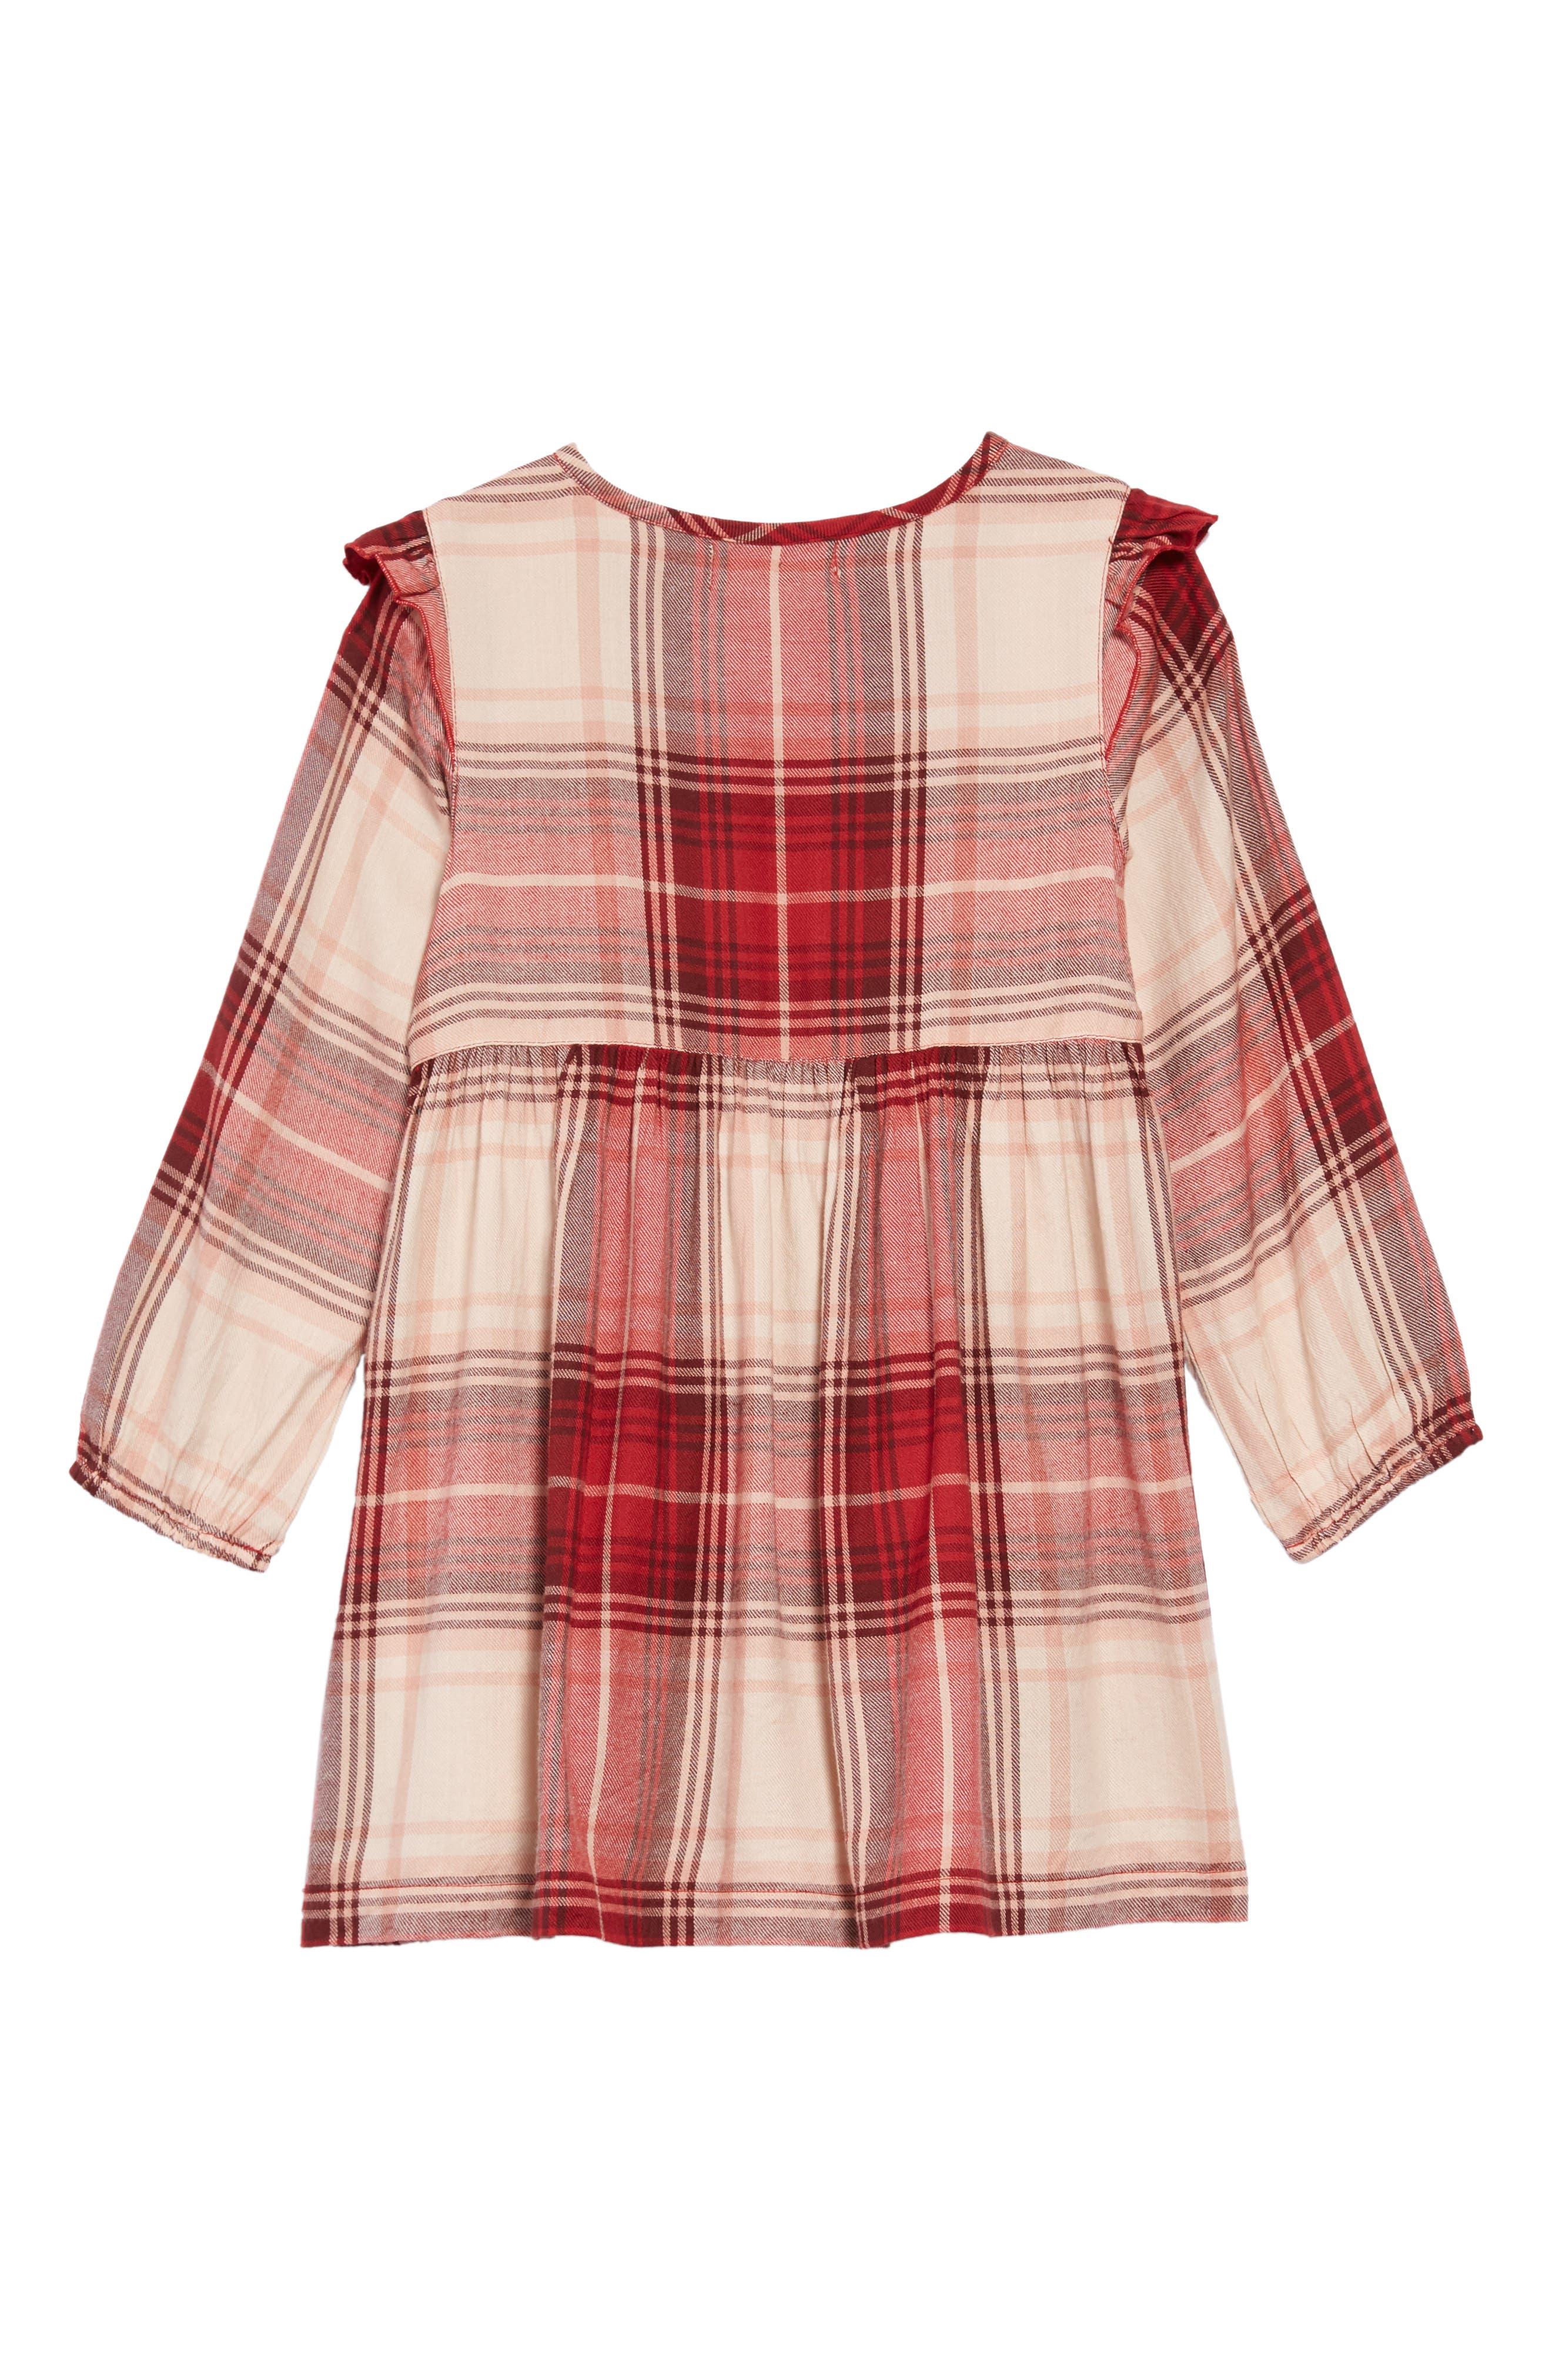 Natalie Plaid Dress,                             Alternate thumbnail 2, color,                             MAROON